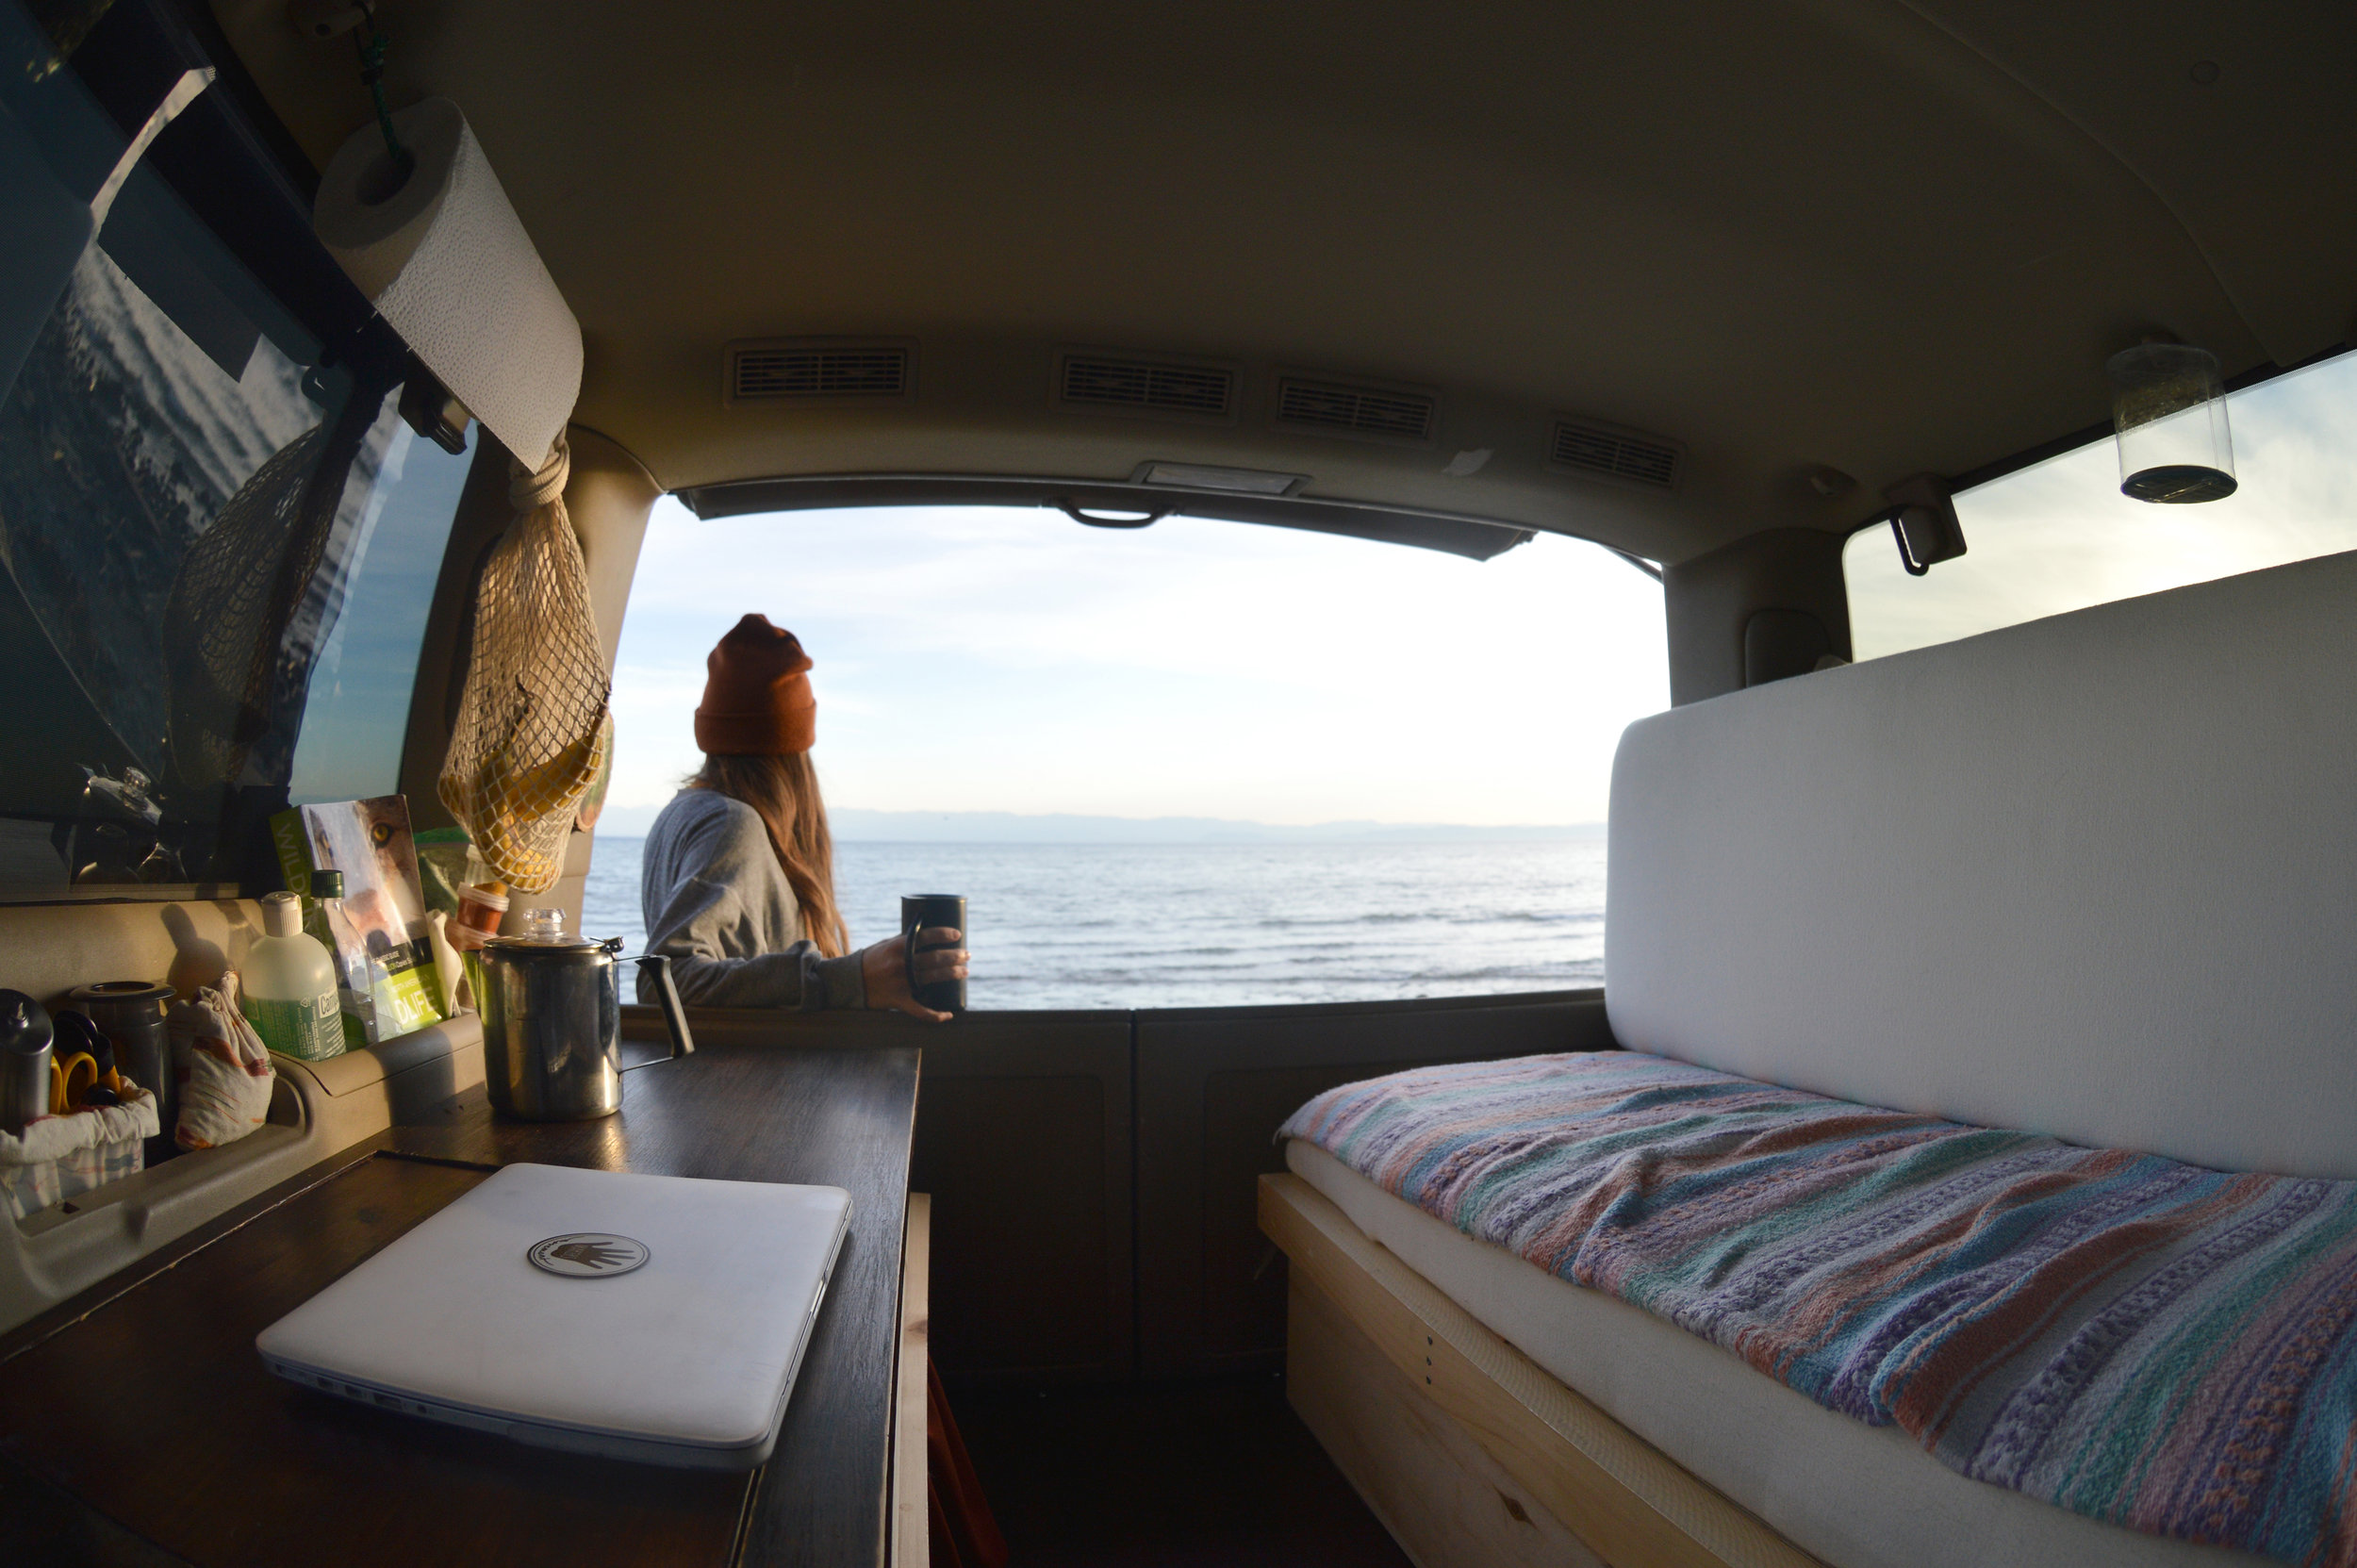 Mornings on the coast, Vancouver Island, shot by    Alvaro Masegosa